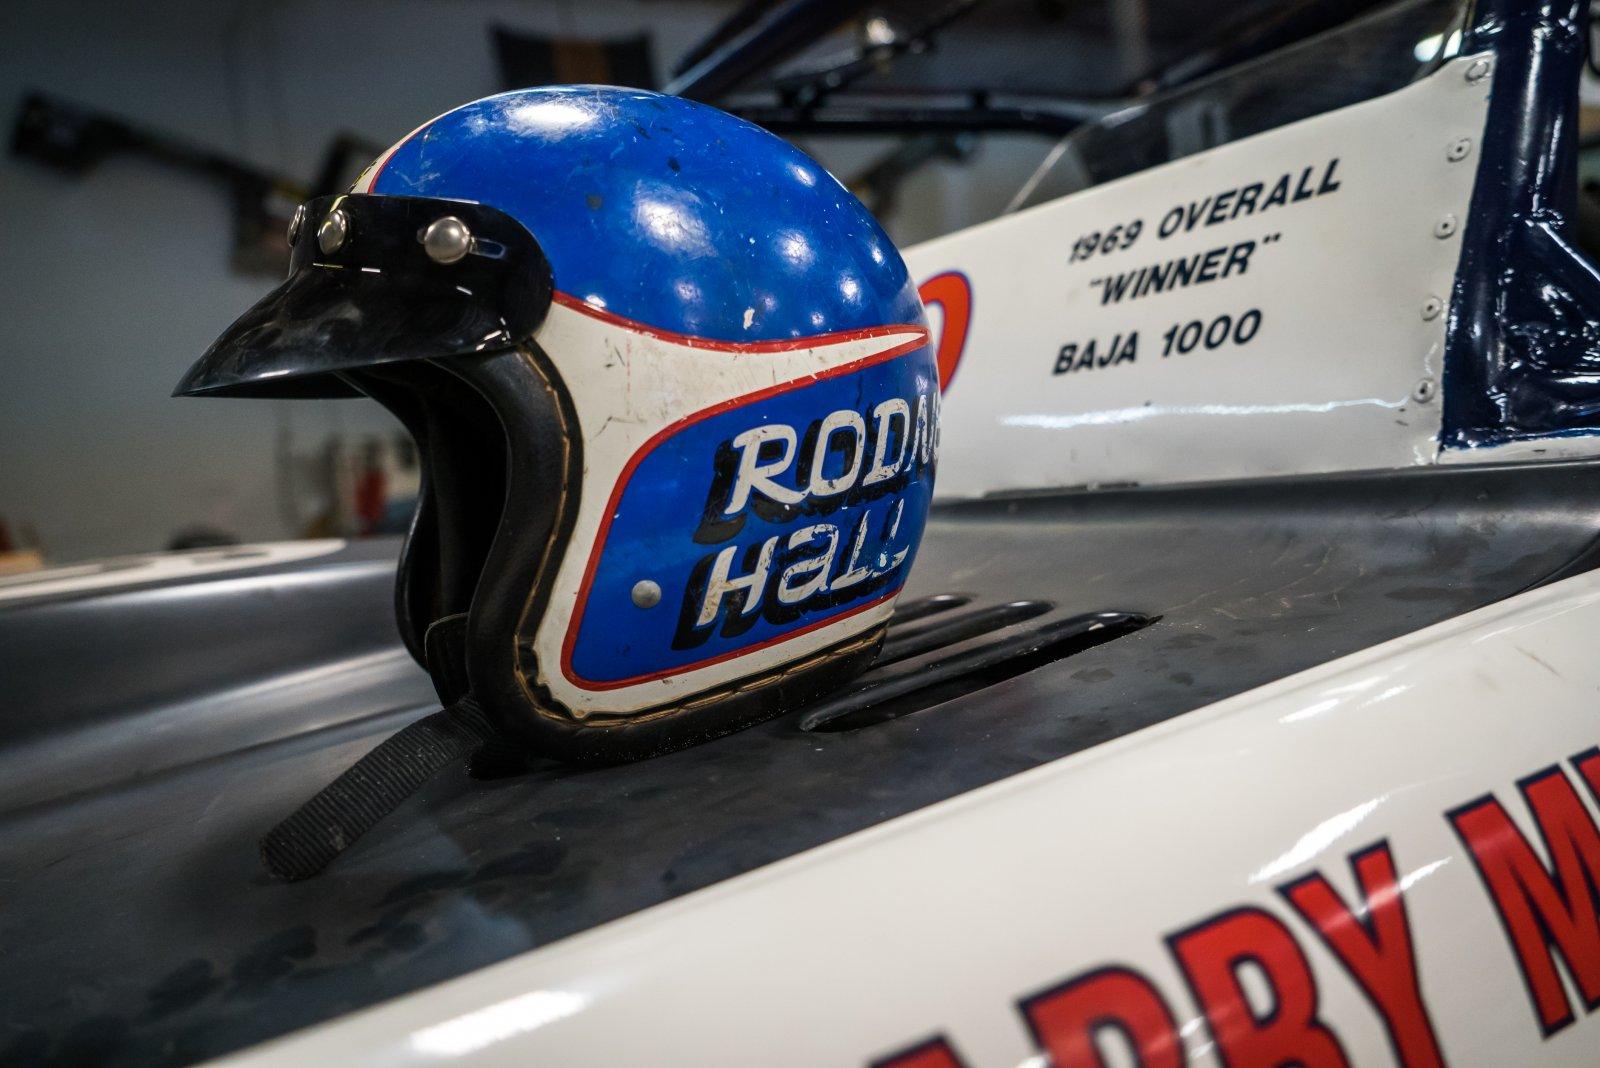 rod-hall-bfgoodrich-tires-48.jpg